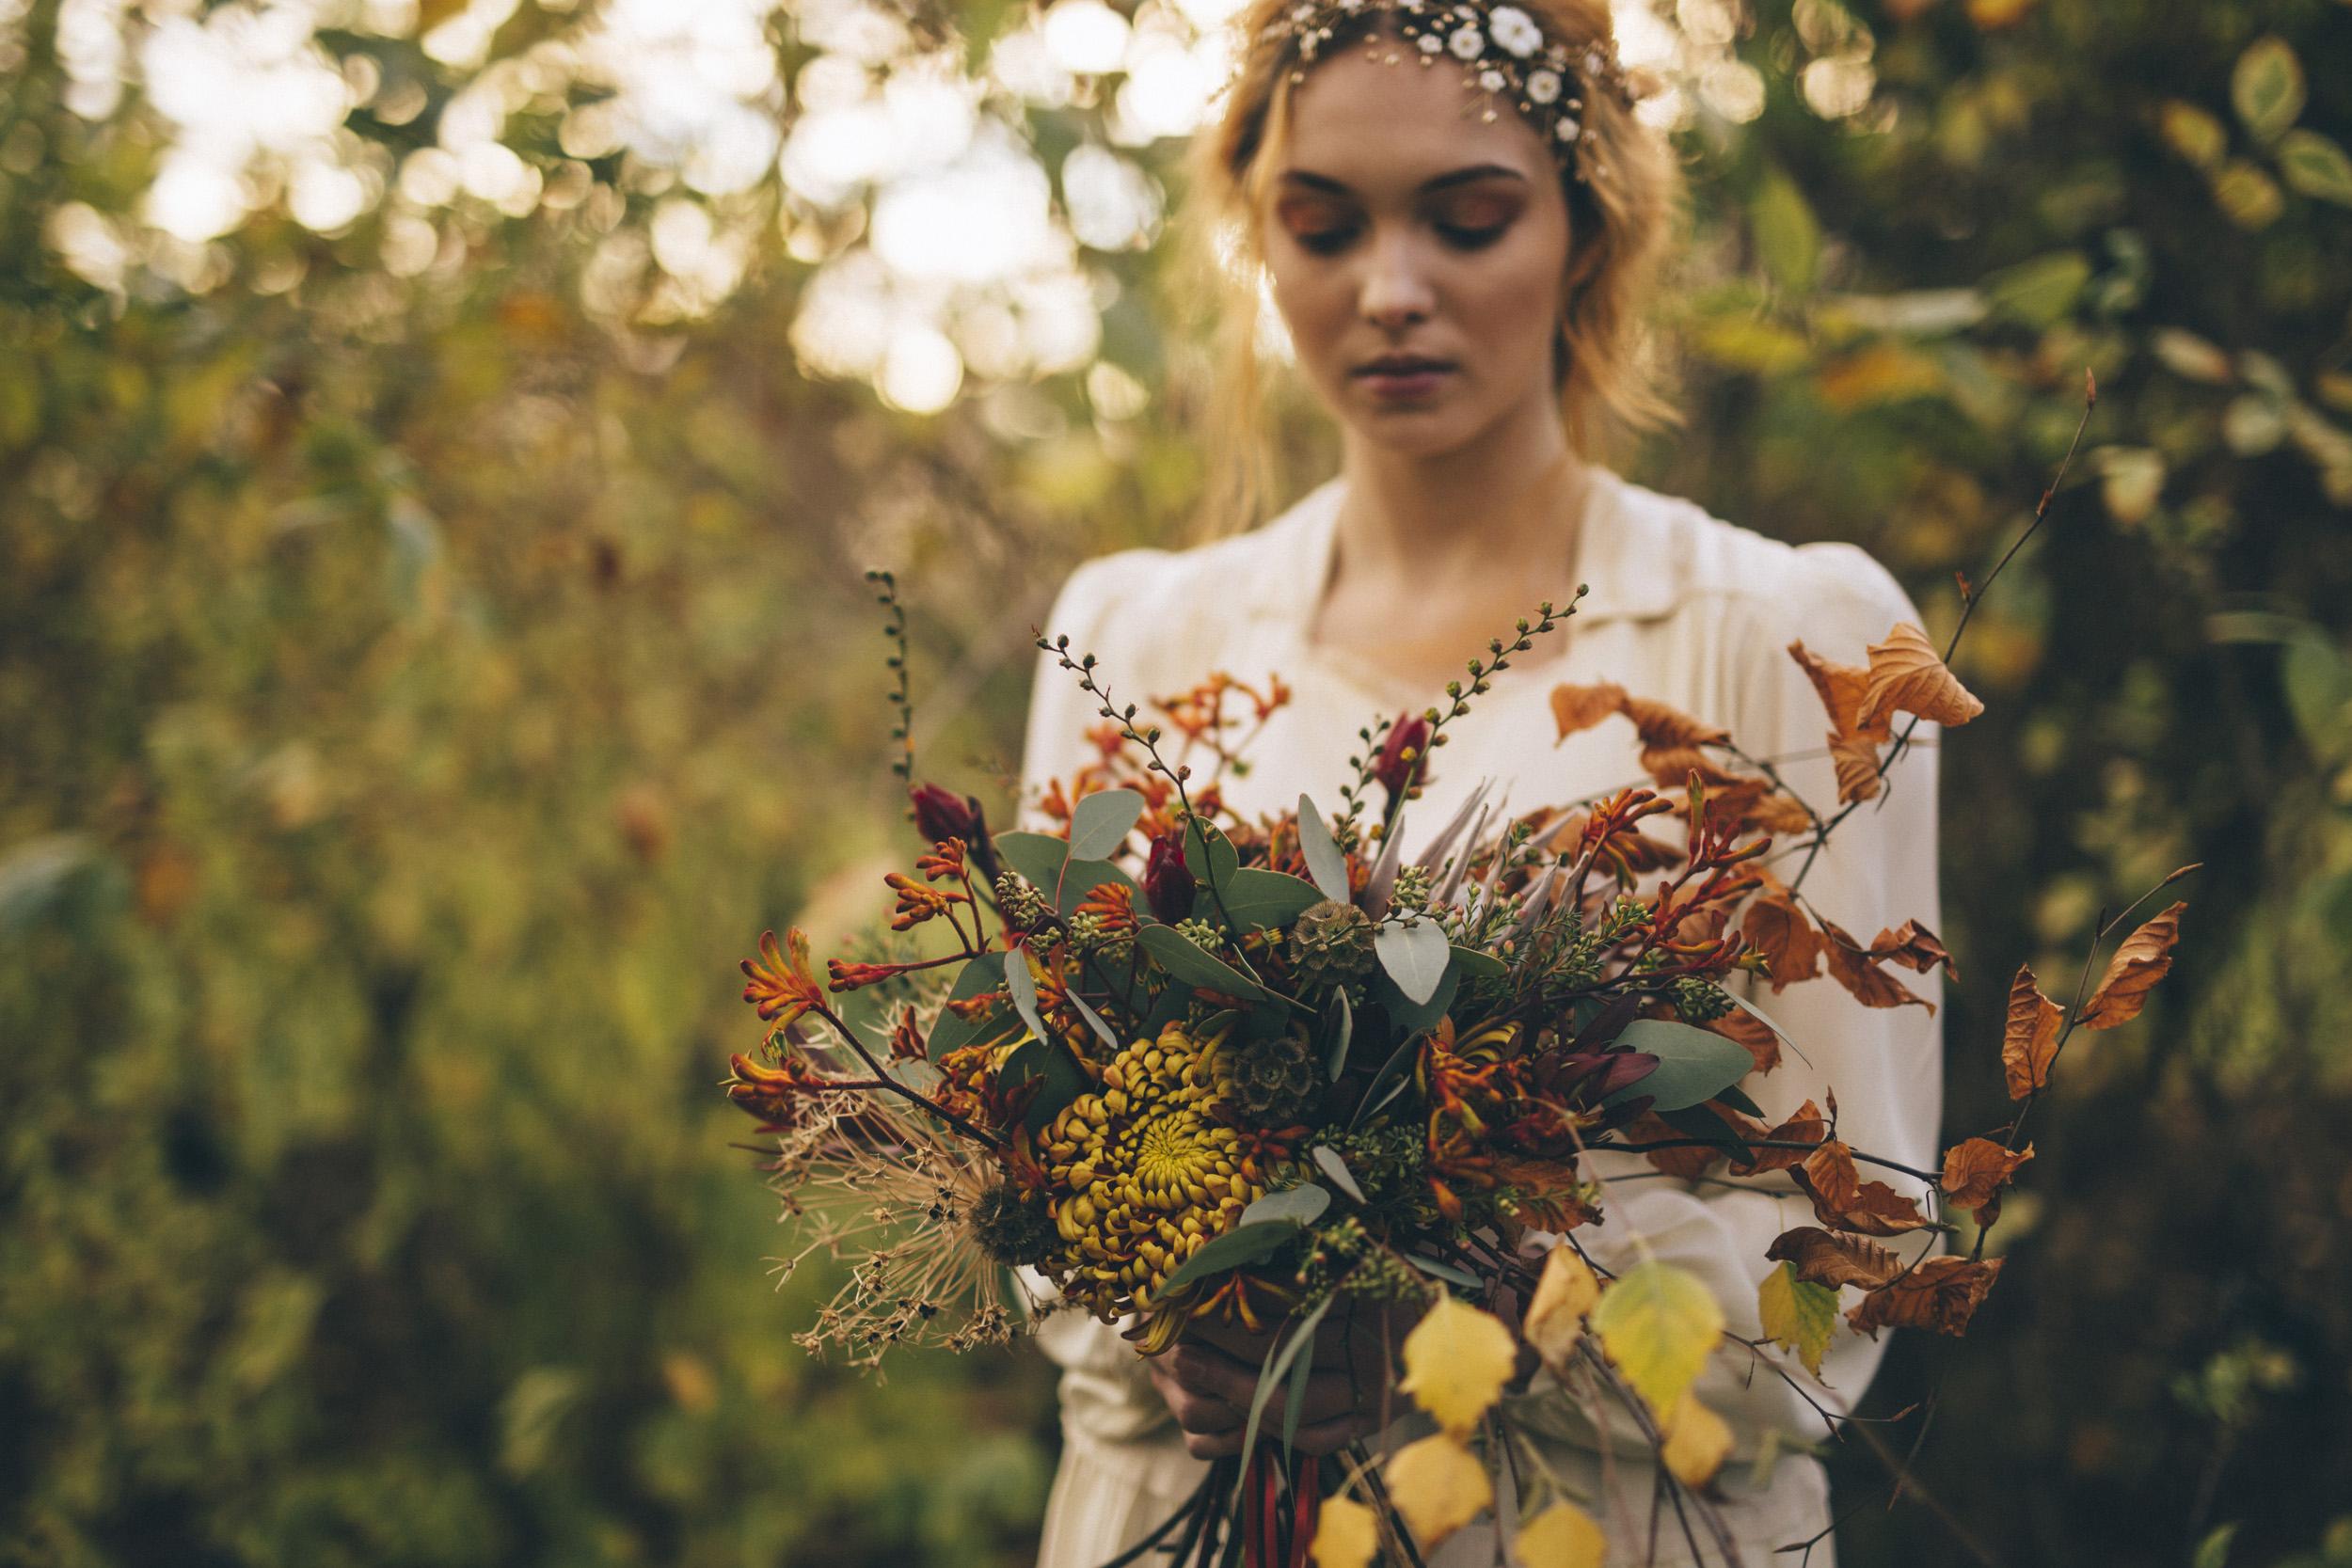 Autumn-Leaves-Shelley-Richmond-Kate-Beaumont-Sheffield-16.jpg